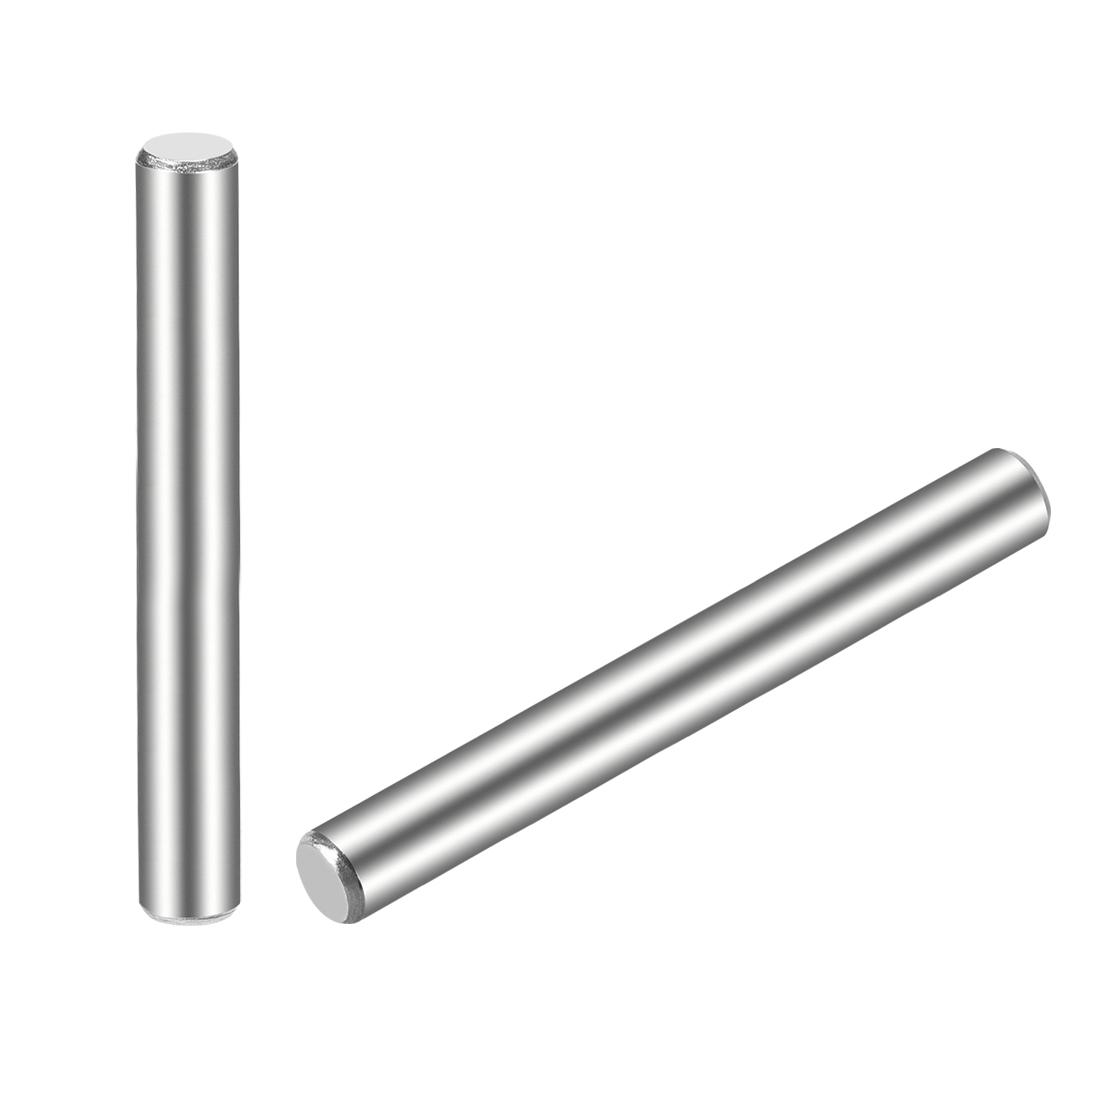 25Pcs 5mm x 55mm Dowel Pin 304 Stainless Steel Shelf Support Pin Fasten